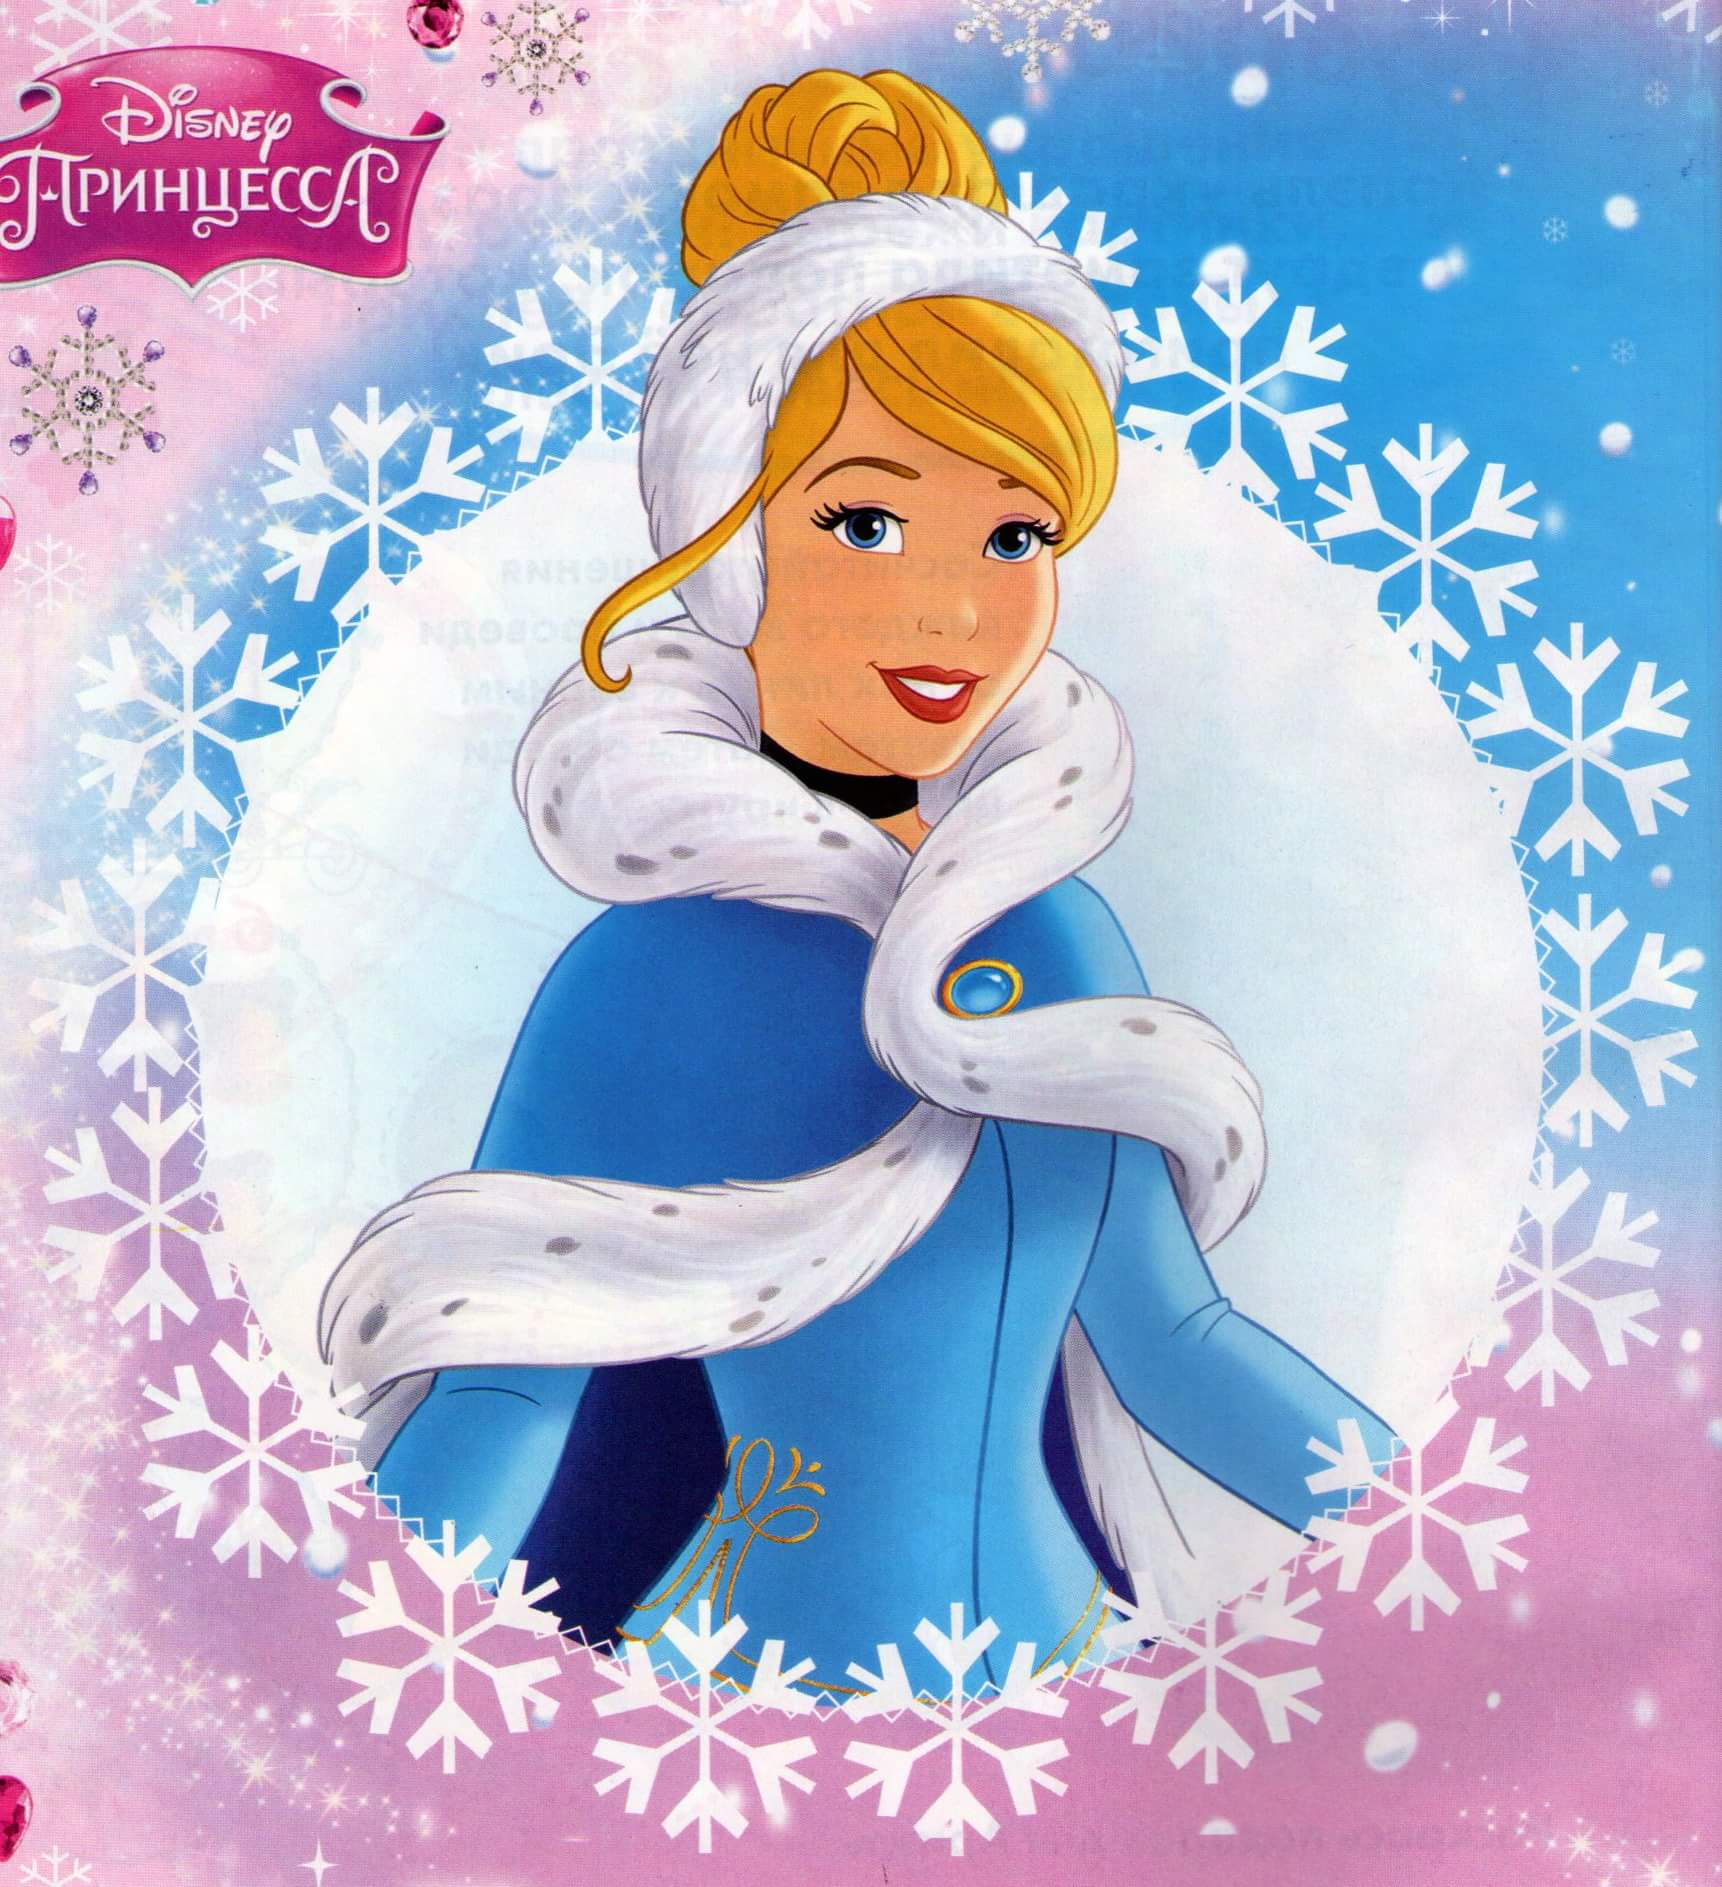 Winter Princesses Cinderella Disney Princess Photo 40372925